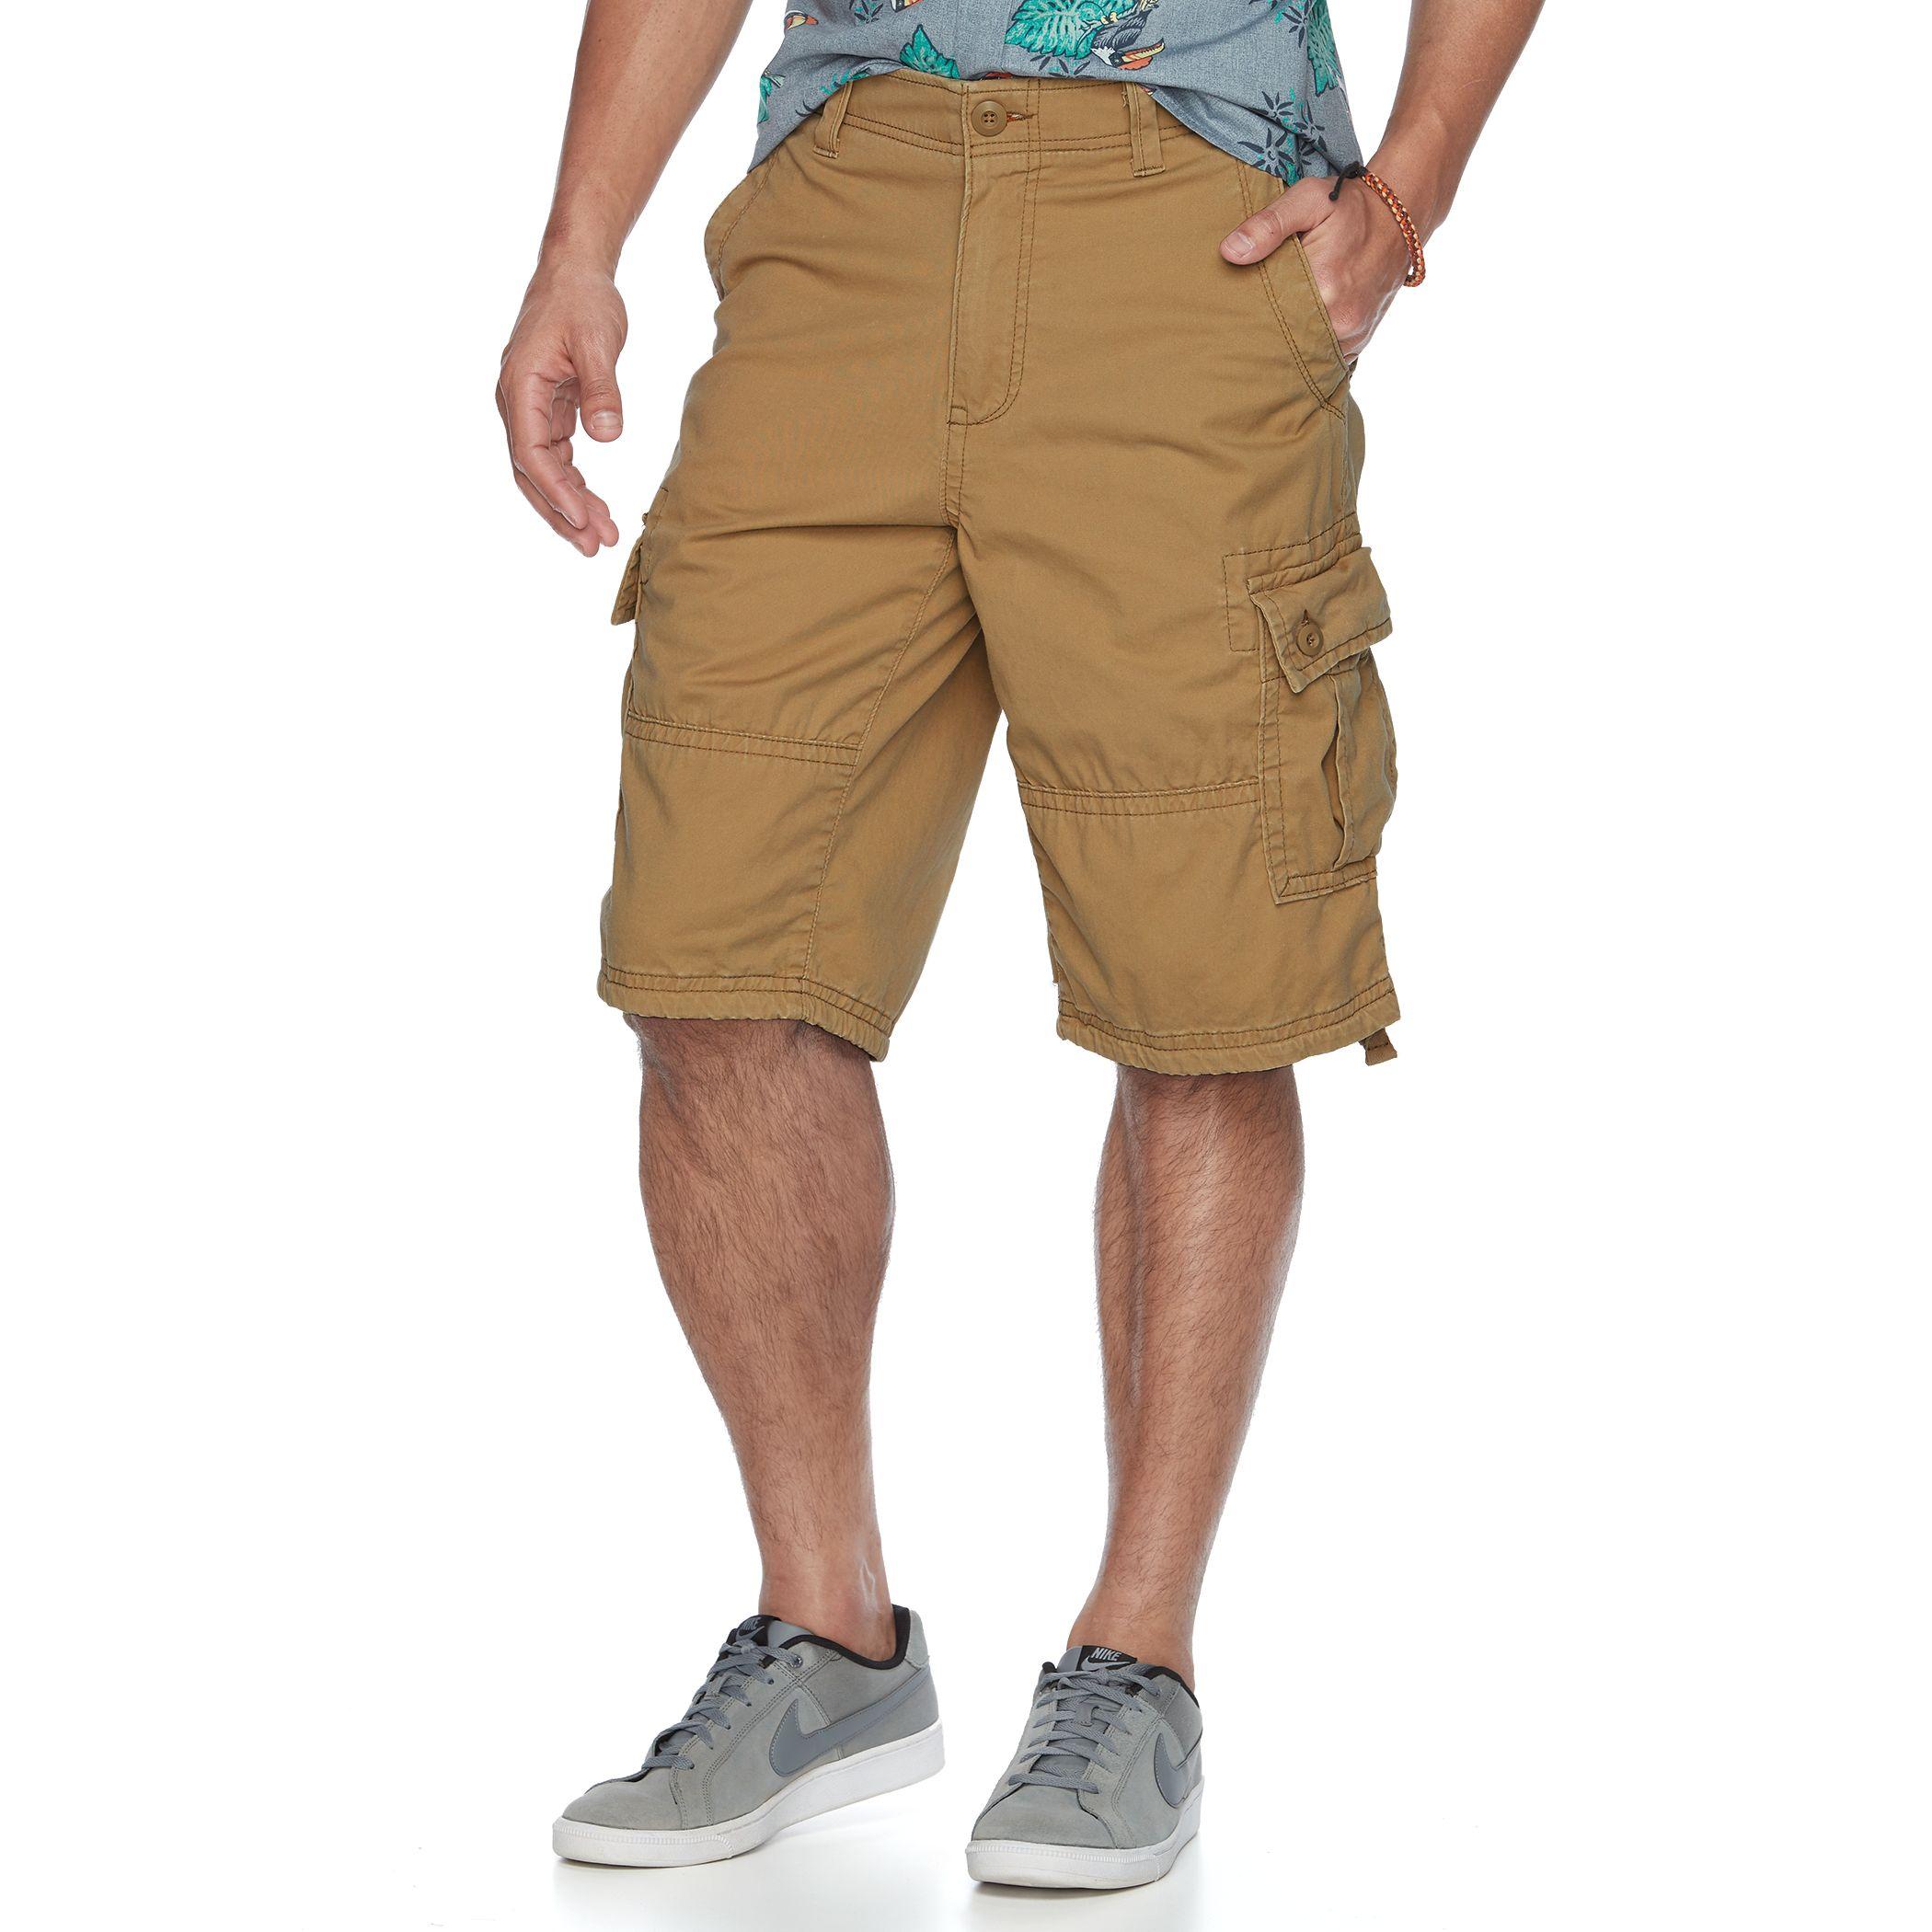 Mens Shorts - Bottoms, Clothing   Kohl's